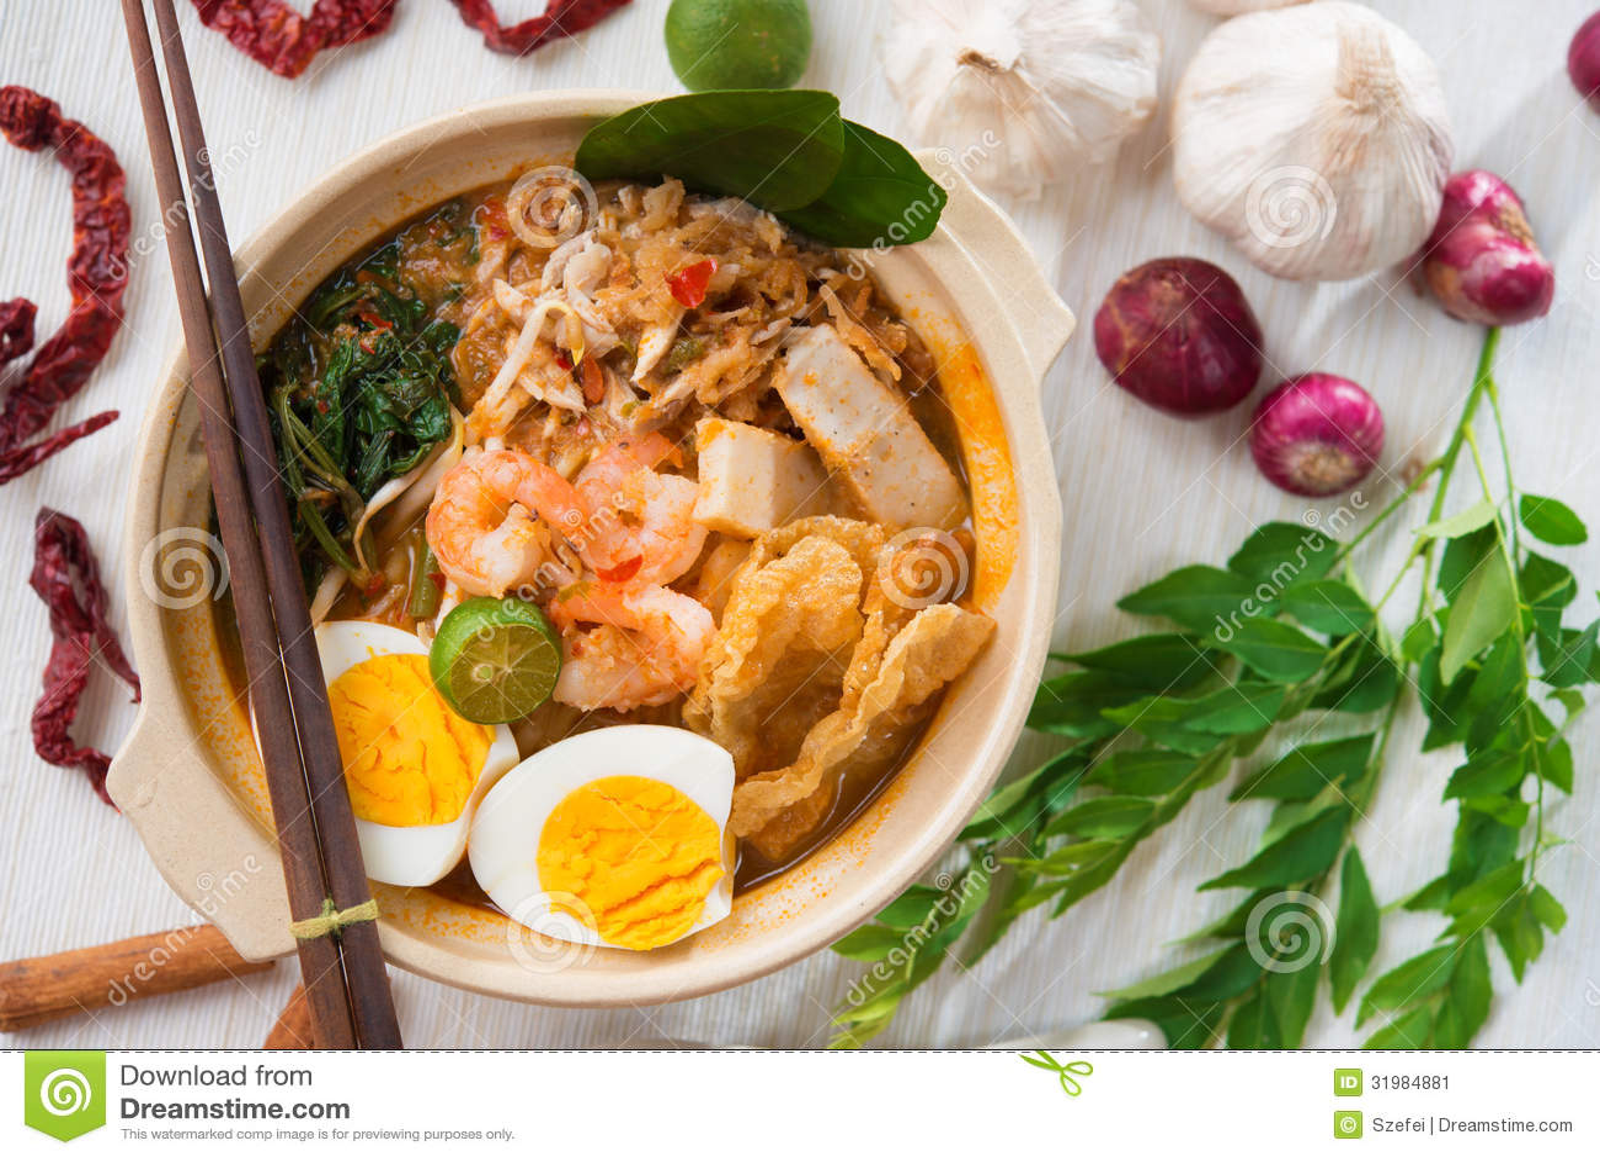 Singaporean prawn mee stock image image 31984881 for Asian cuisine singapore